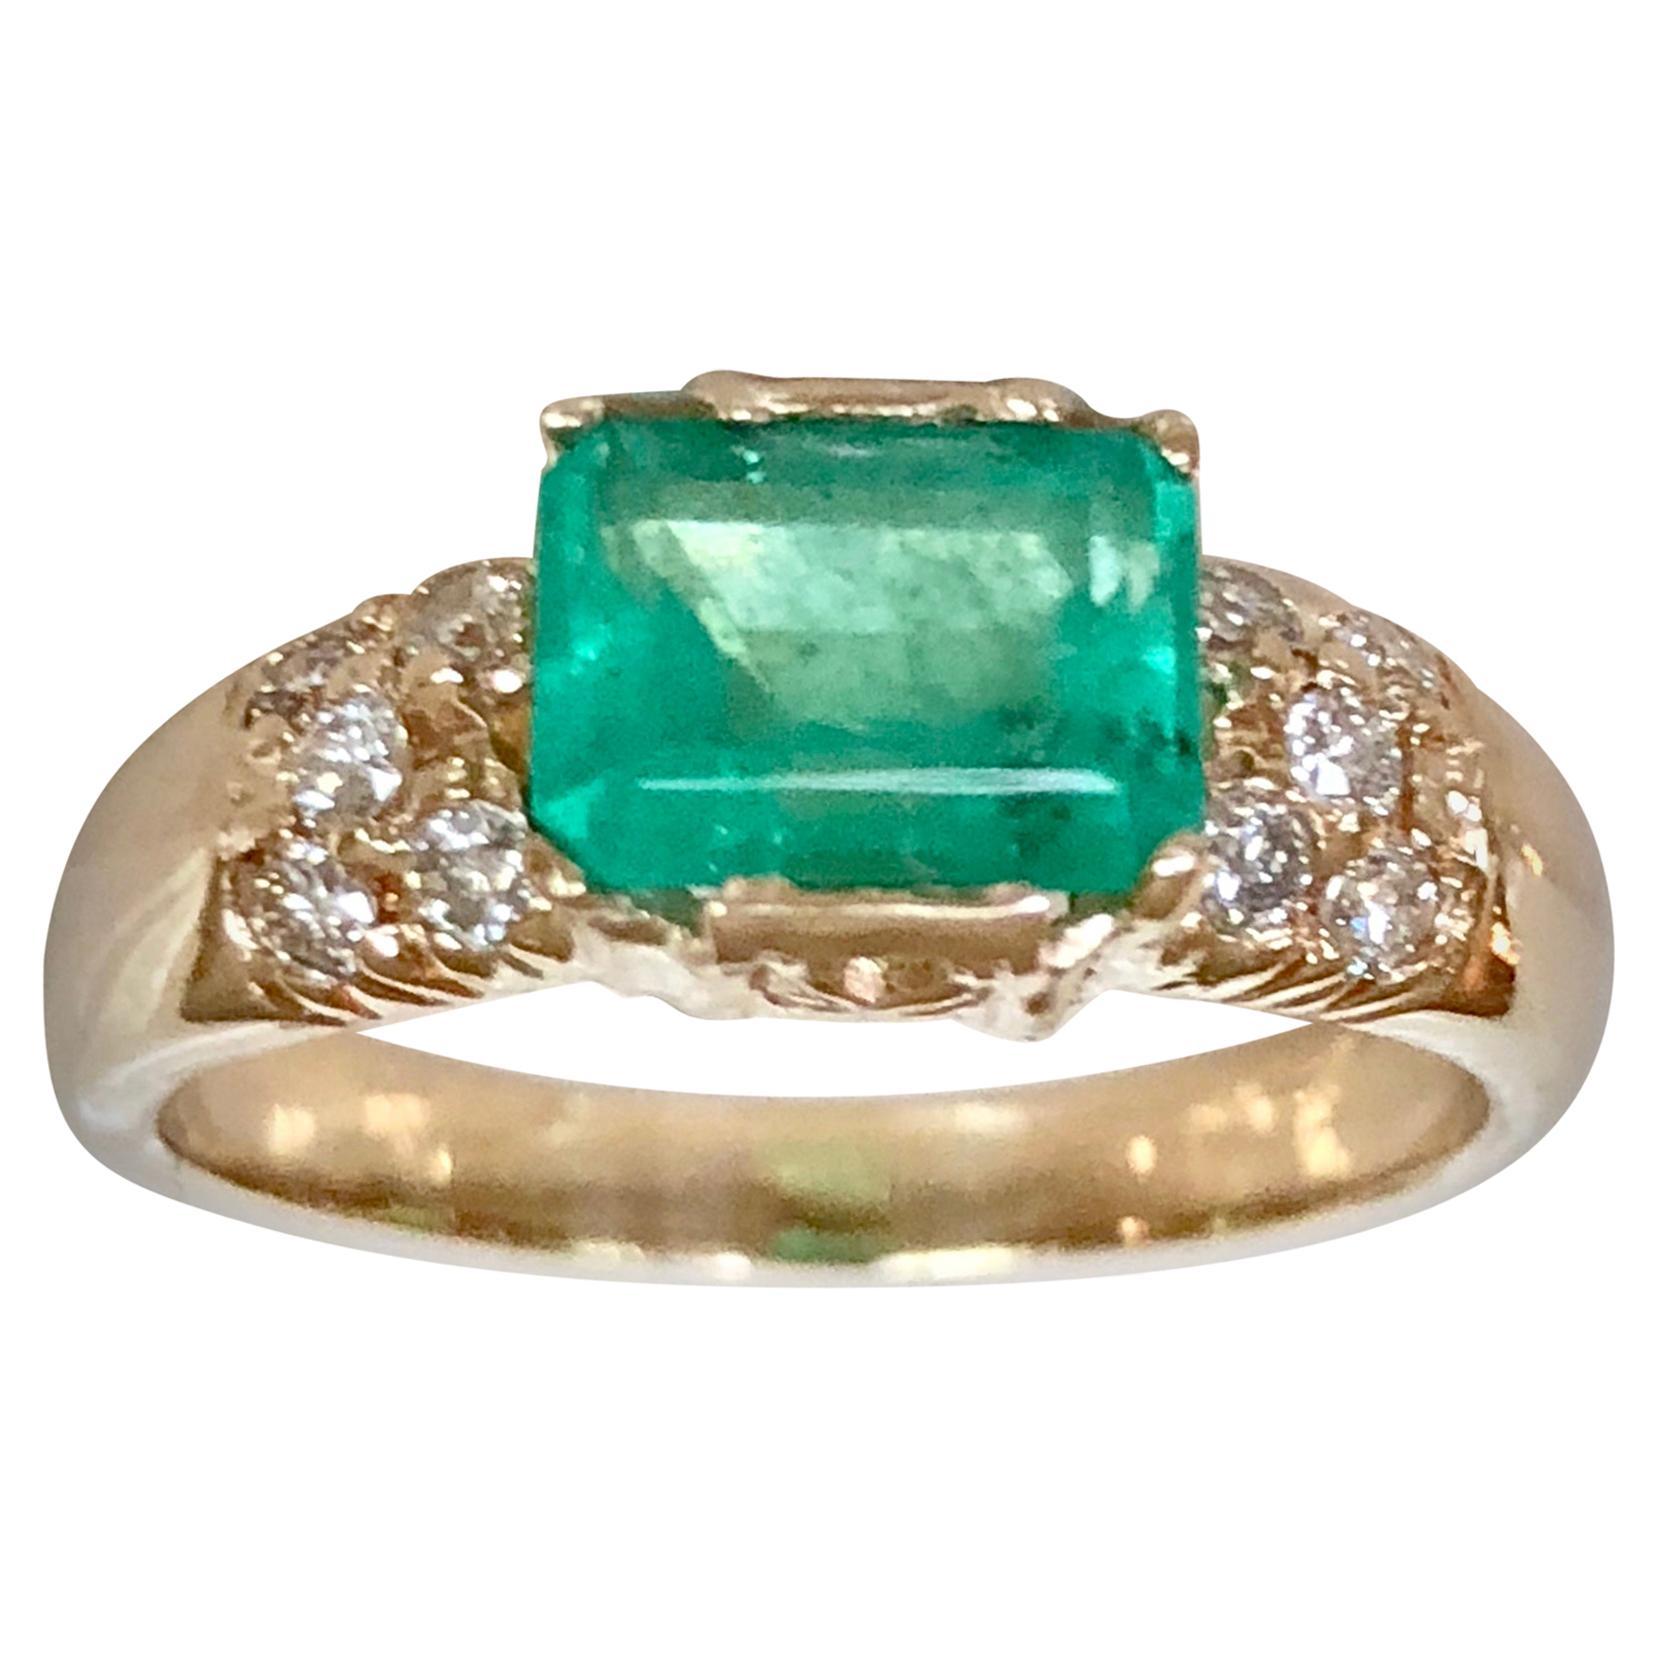 1.60 Carat Vintage Natural Emerald Ring Diamond Accents 14 Karat Yellow Gold